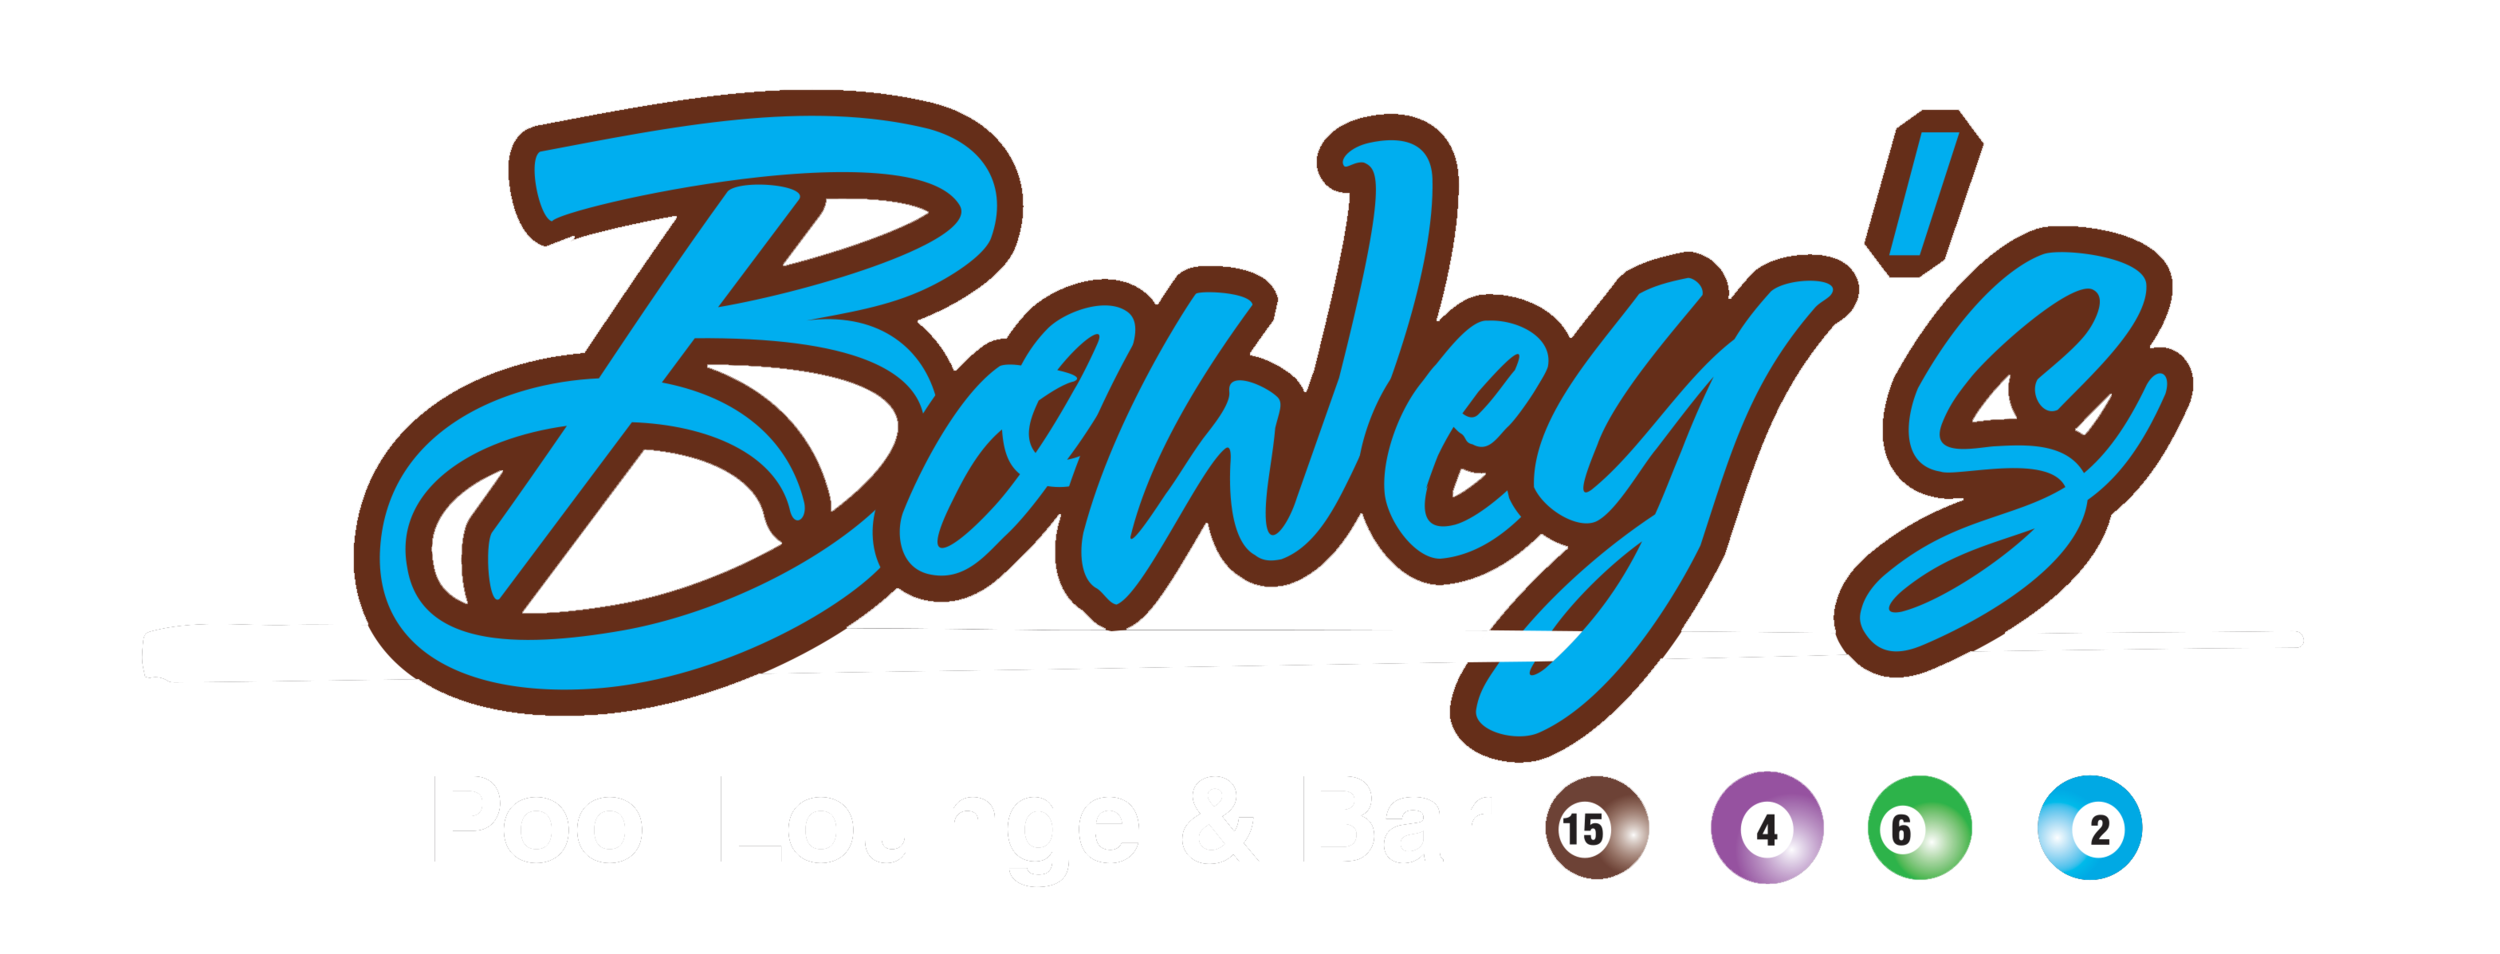 Boweys logo.png